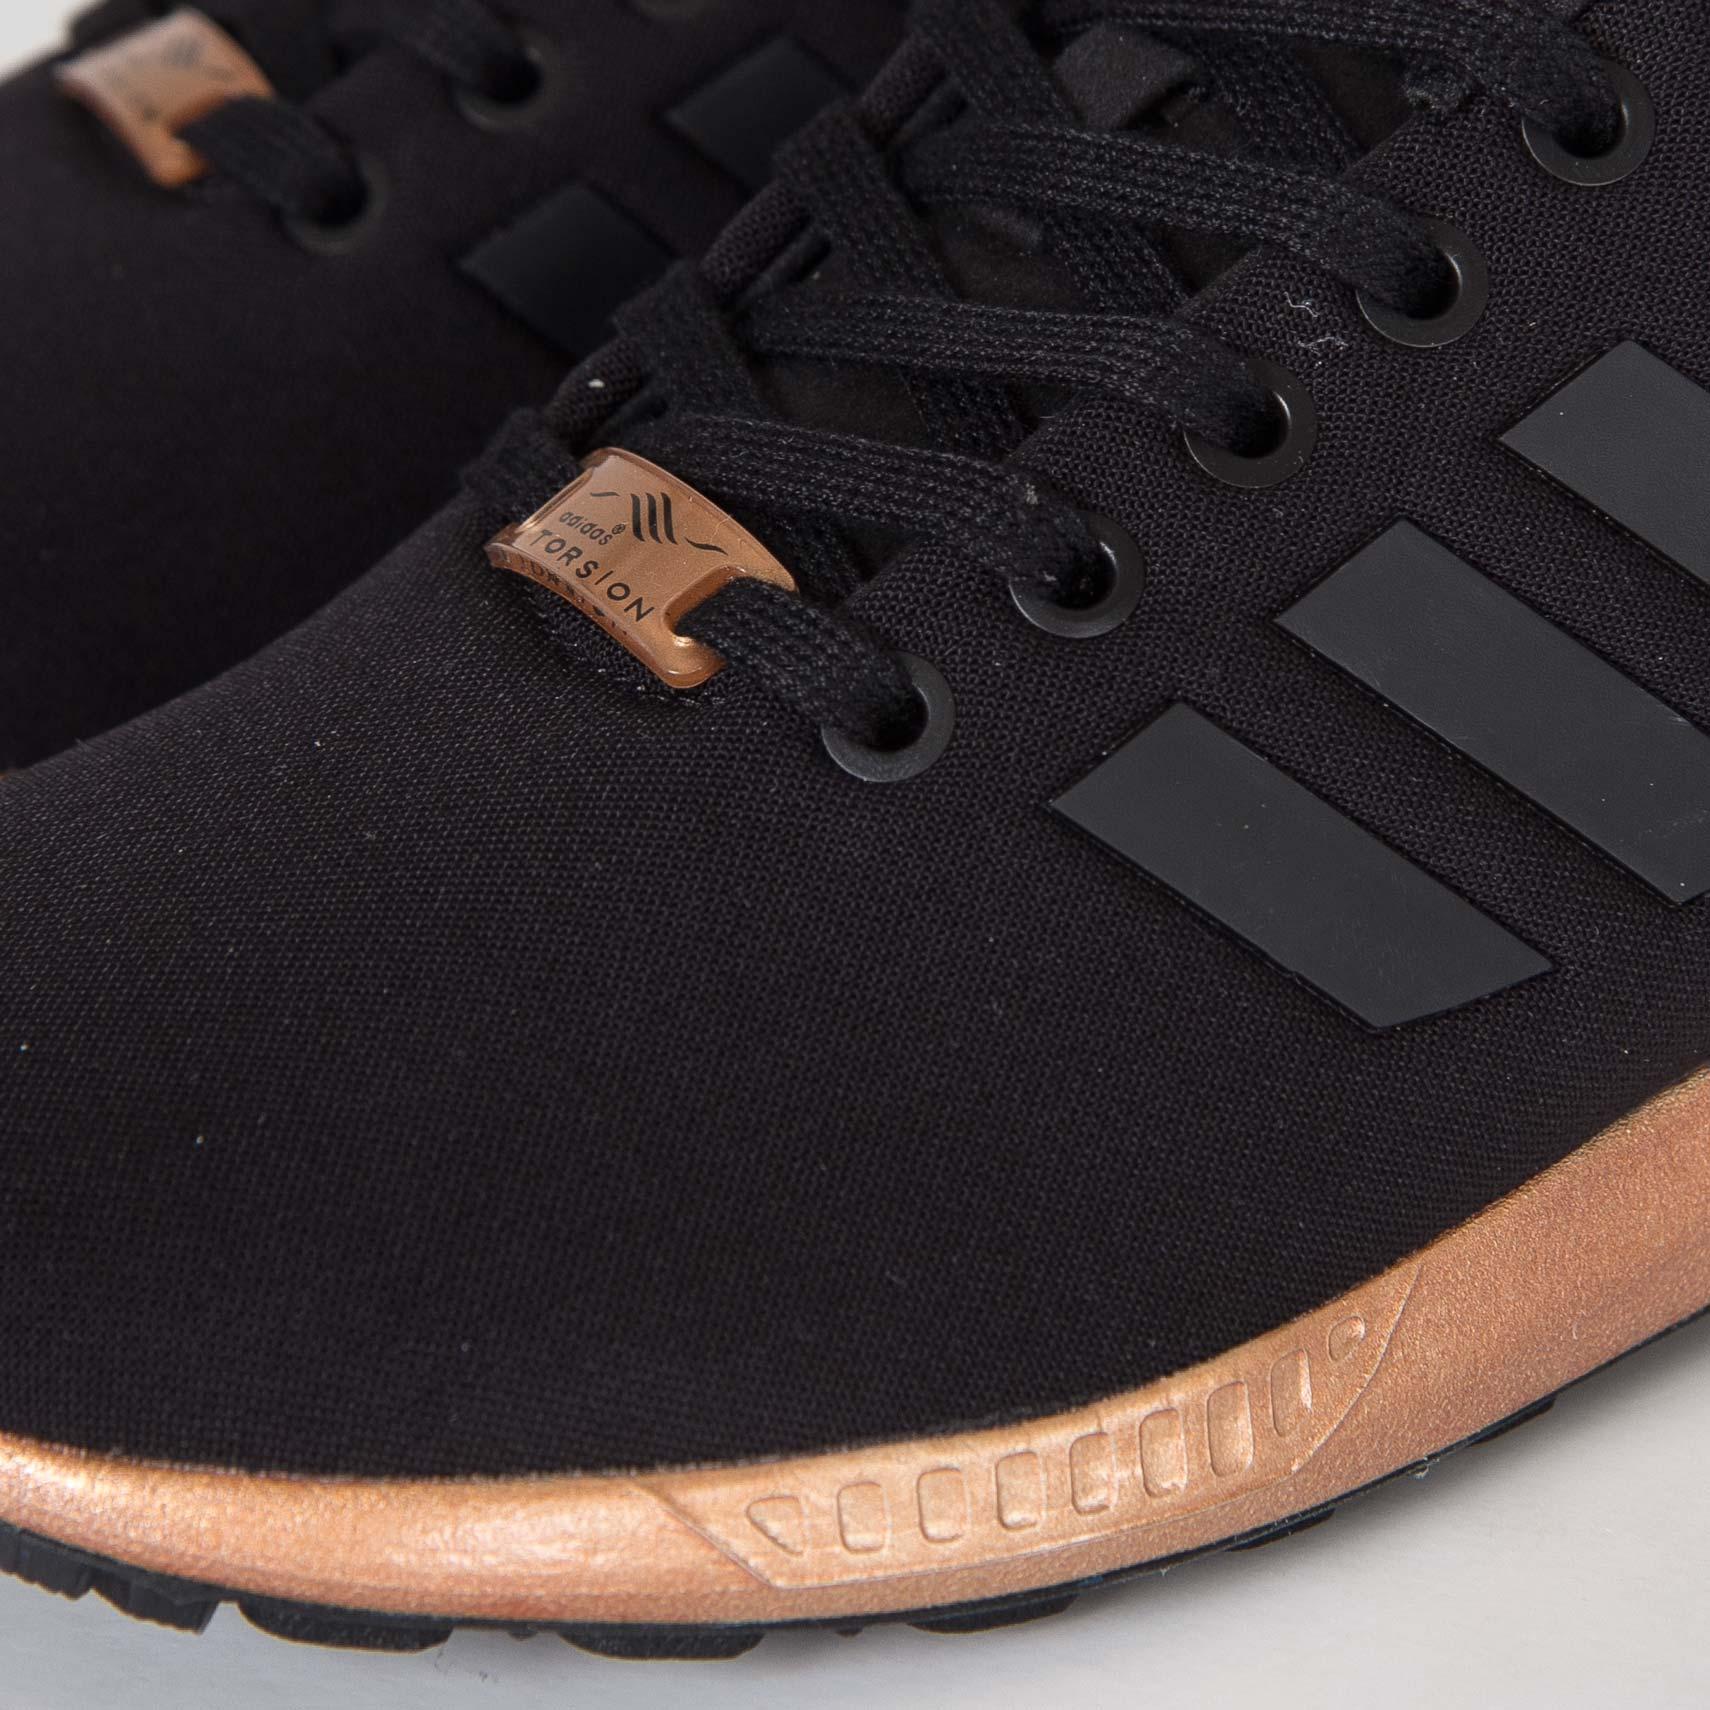 a73d5653f adidas ZX Flux W - S78977 - Sneakersnstuff